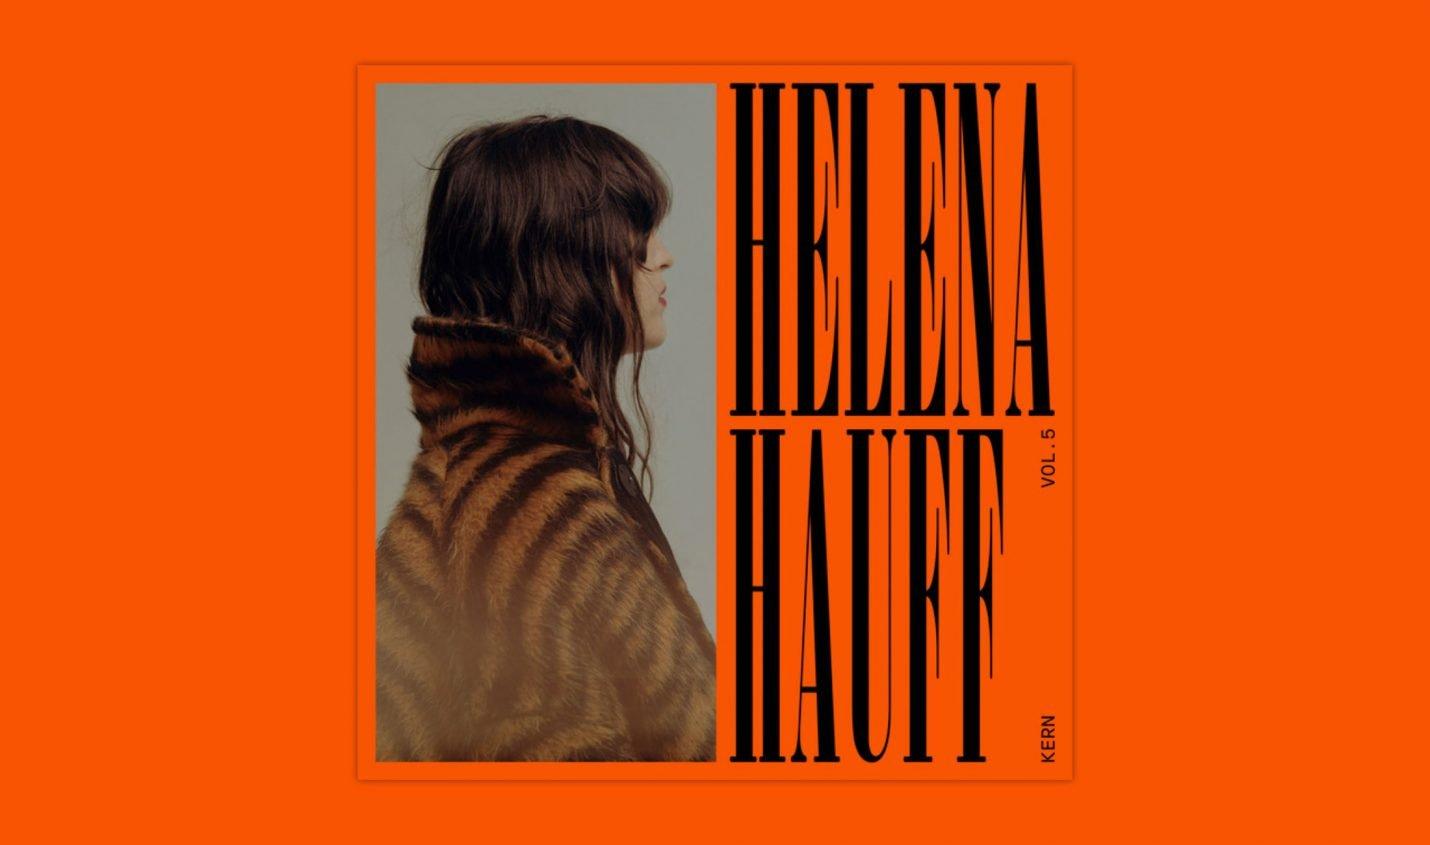 Review: Helena Hauff – Kern, Vol. 5 [Tresor]